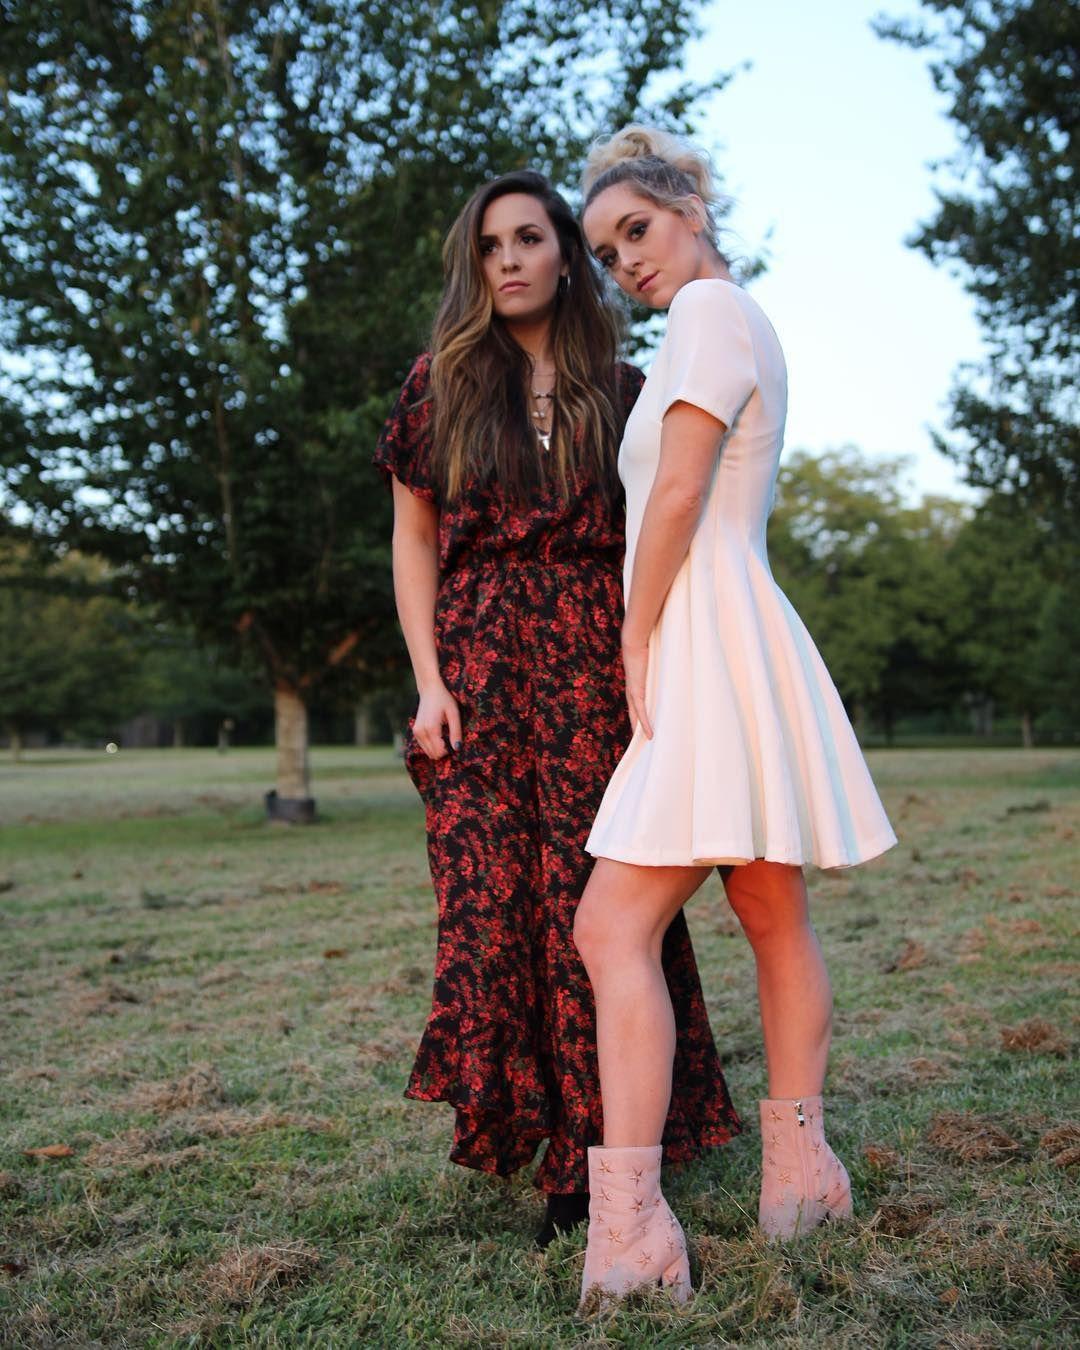 15 Chic Half Up Half Down Wedding Hairstyles For Long Hair: Megan & Liz Image By Matéa Aurelia